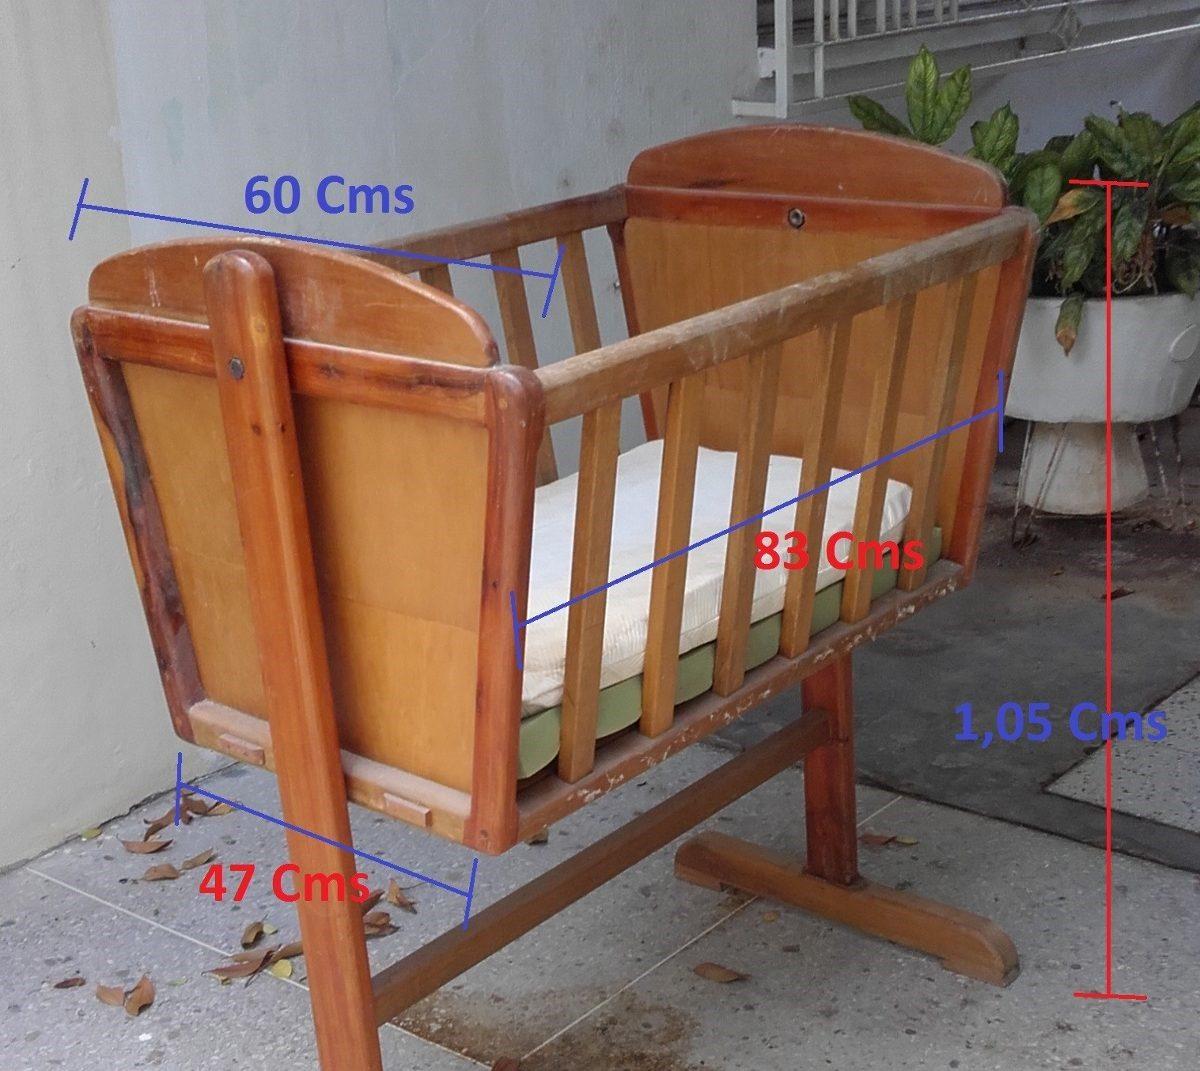 Cuna de madera para bebes usada bs en - Cunas rusticas para bebes ...